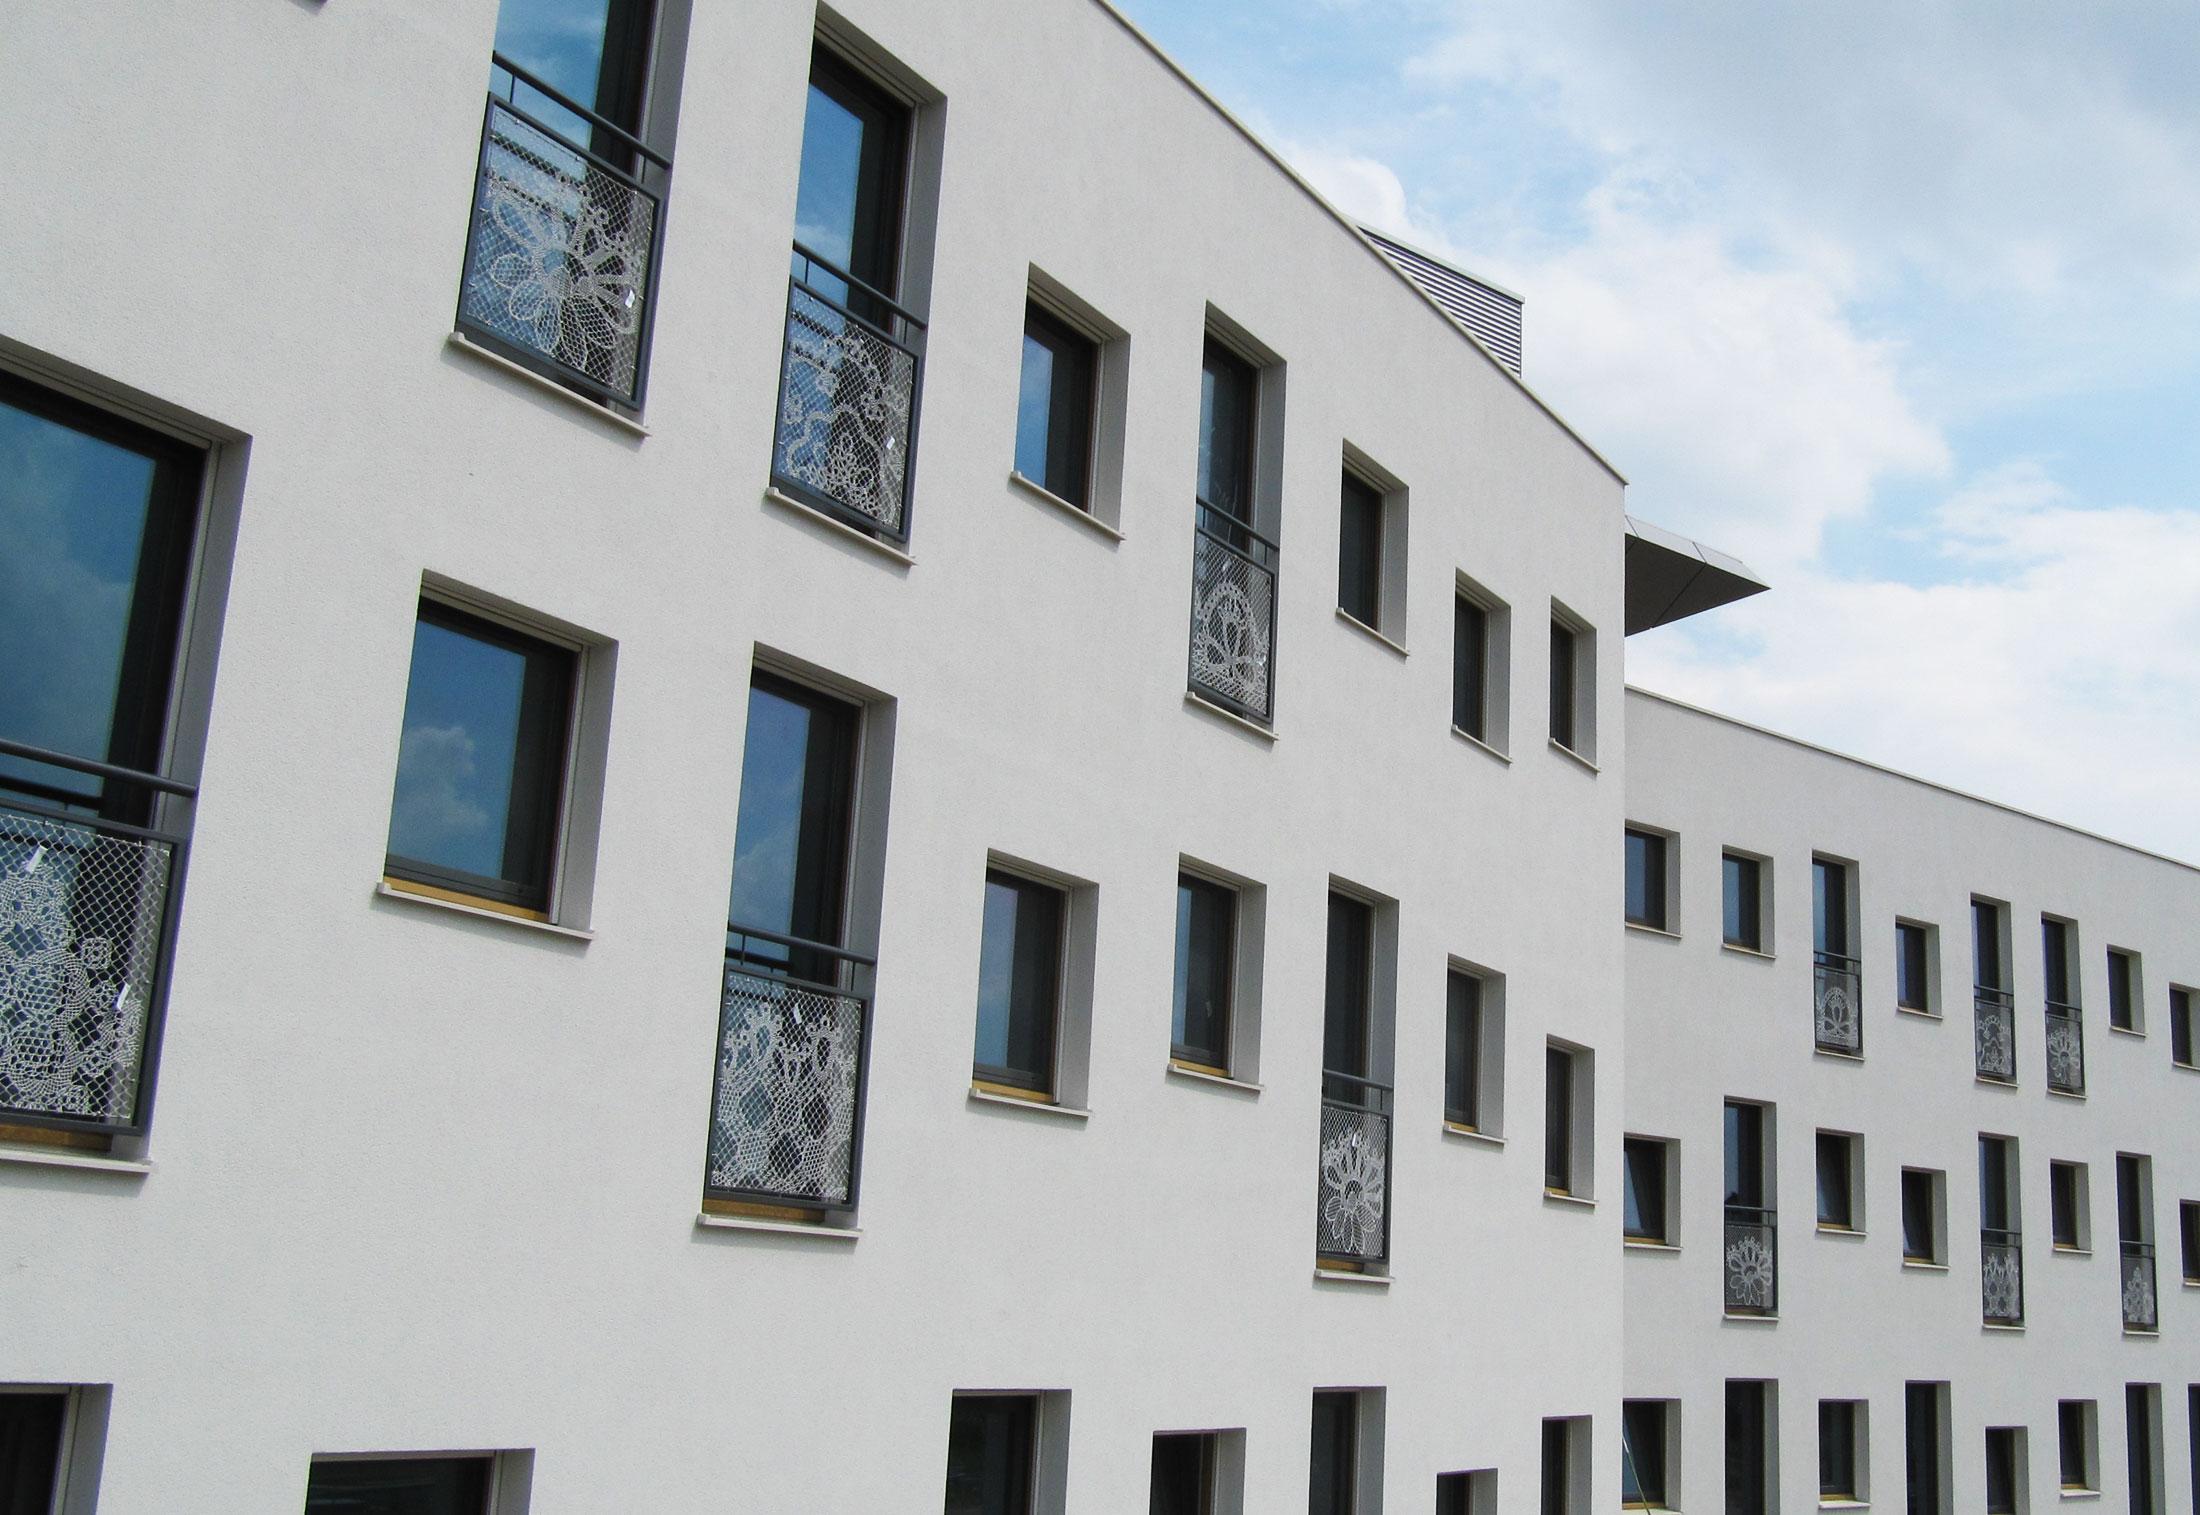 Nursing home zoetermeer netherlands by lace fence for Home design zoetermeer